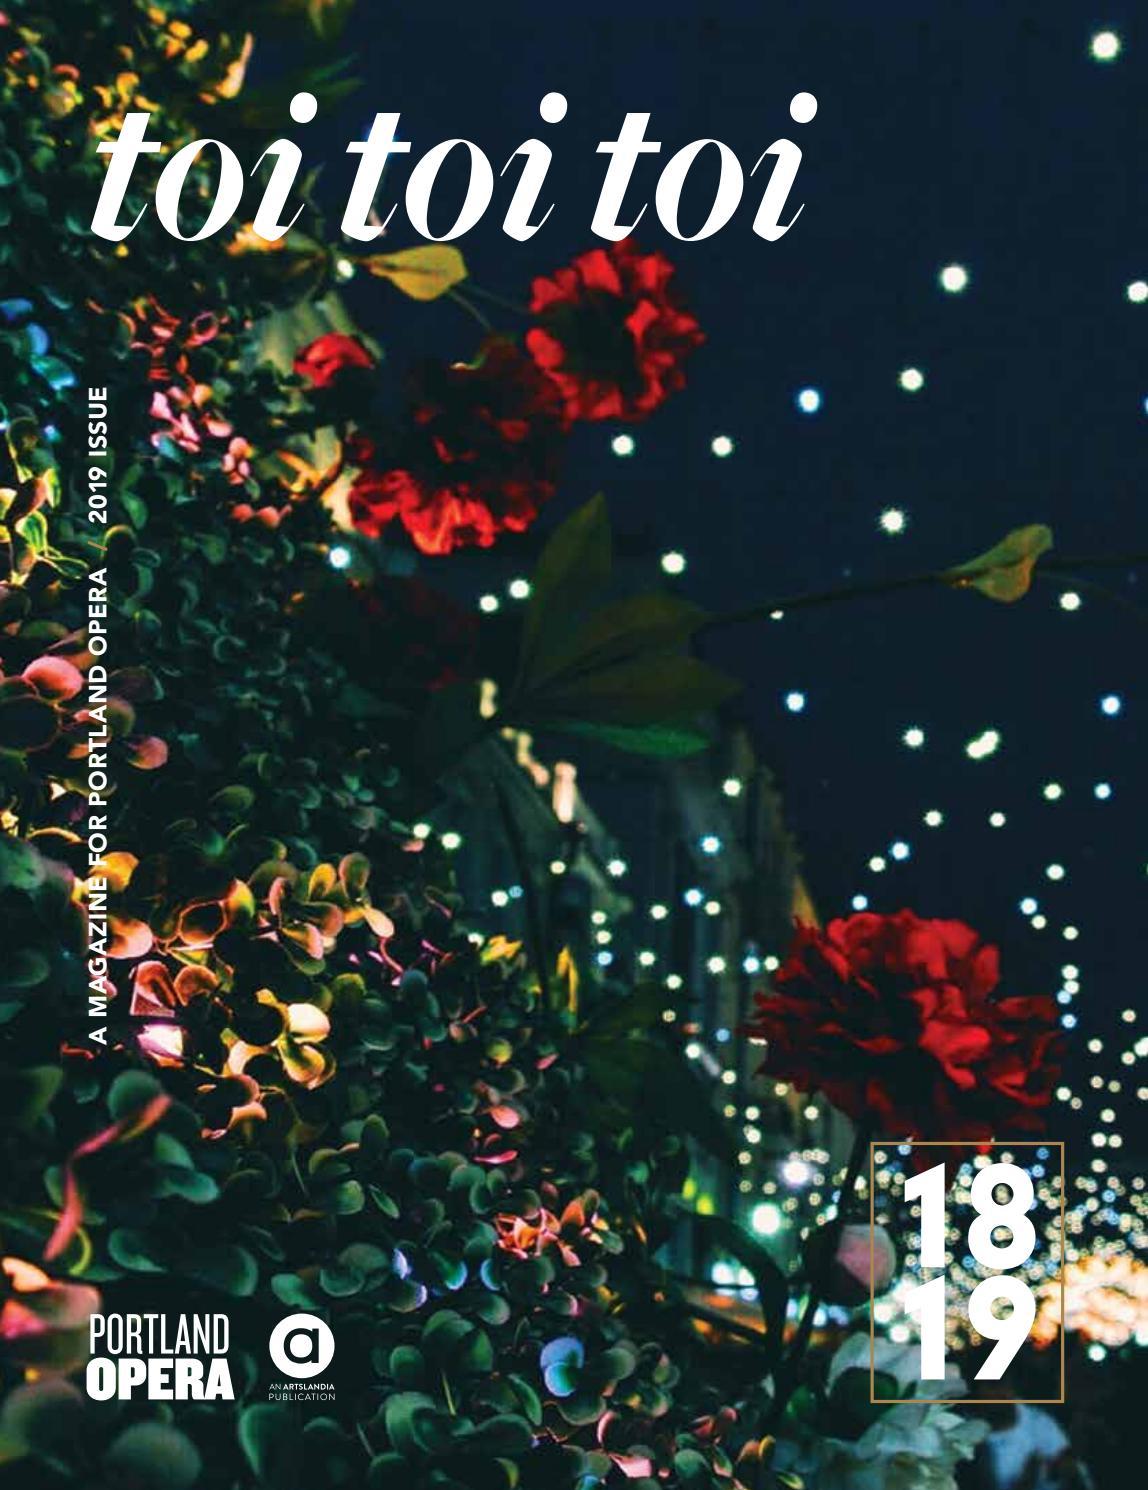 Toi Toi Toi - Portland Opera 2018/19 by Artslandia - issuu